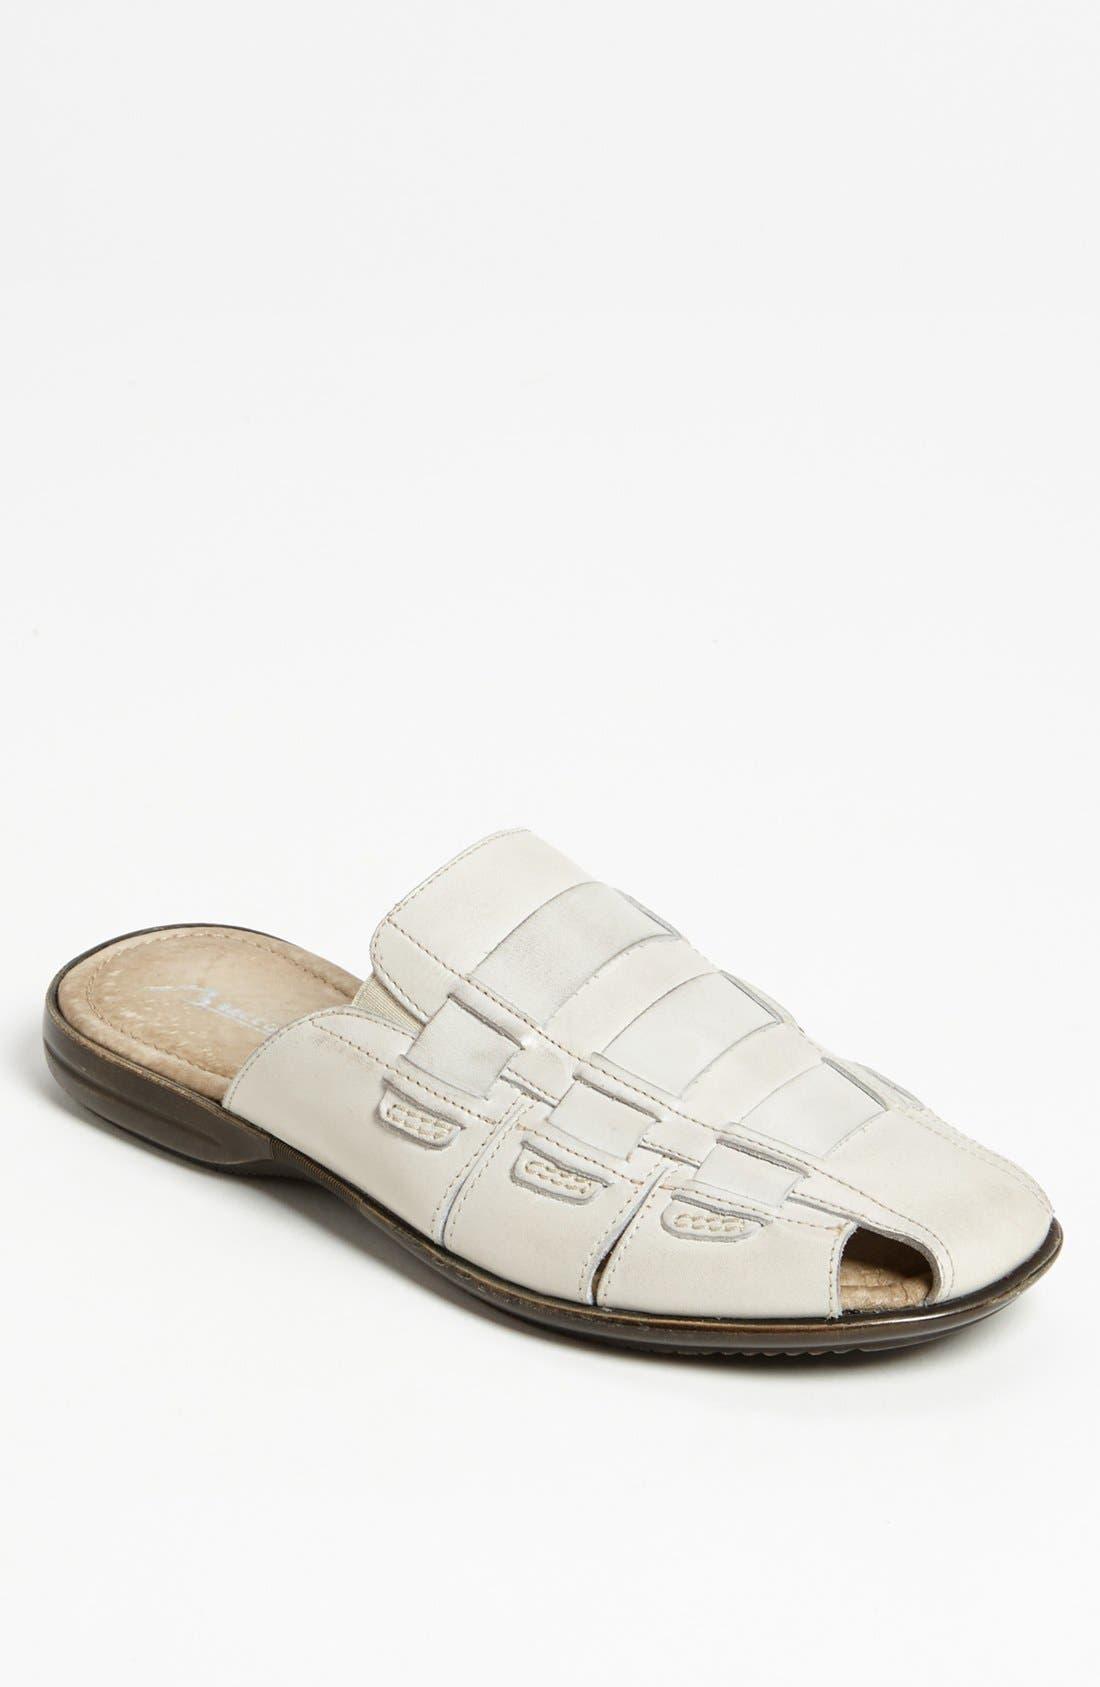 Alternate Image 1 Selected - Bacco Bucci 'Ruggeri' Sandal (Men)